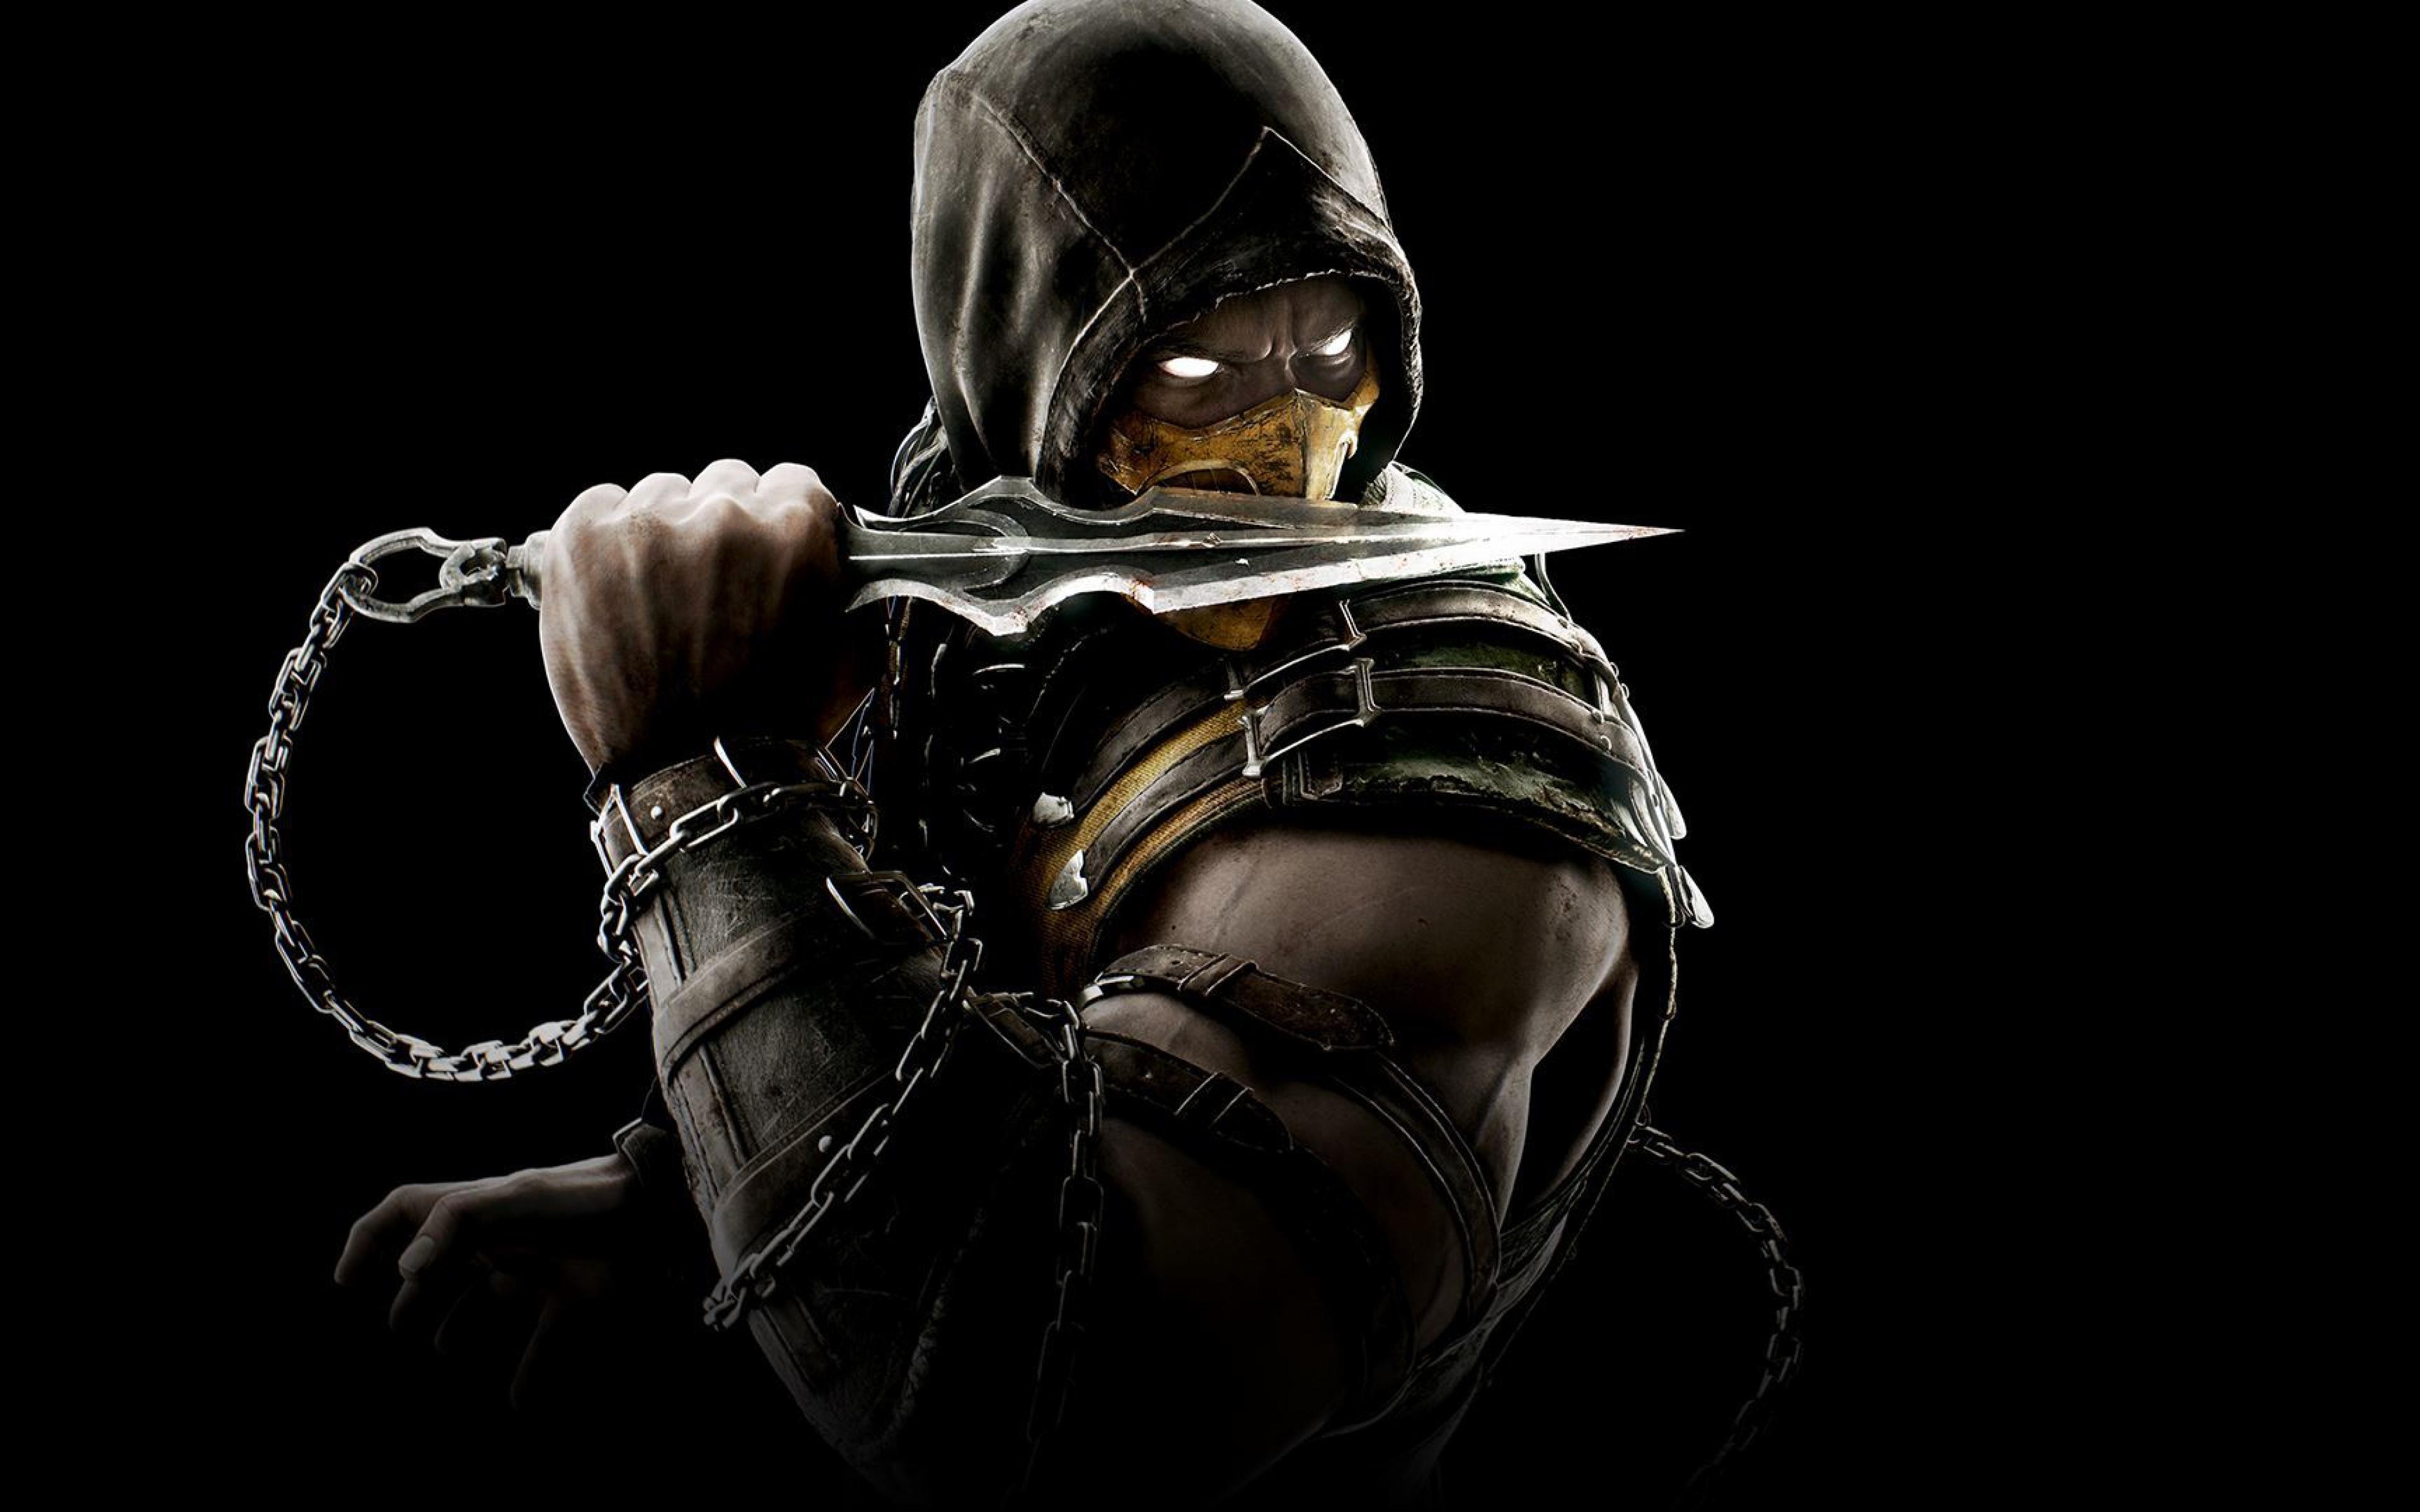 Mortal Kombat X Hd Background